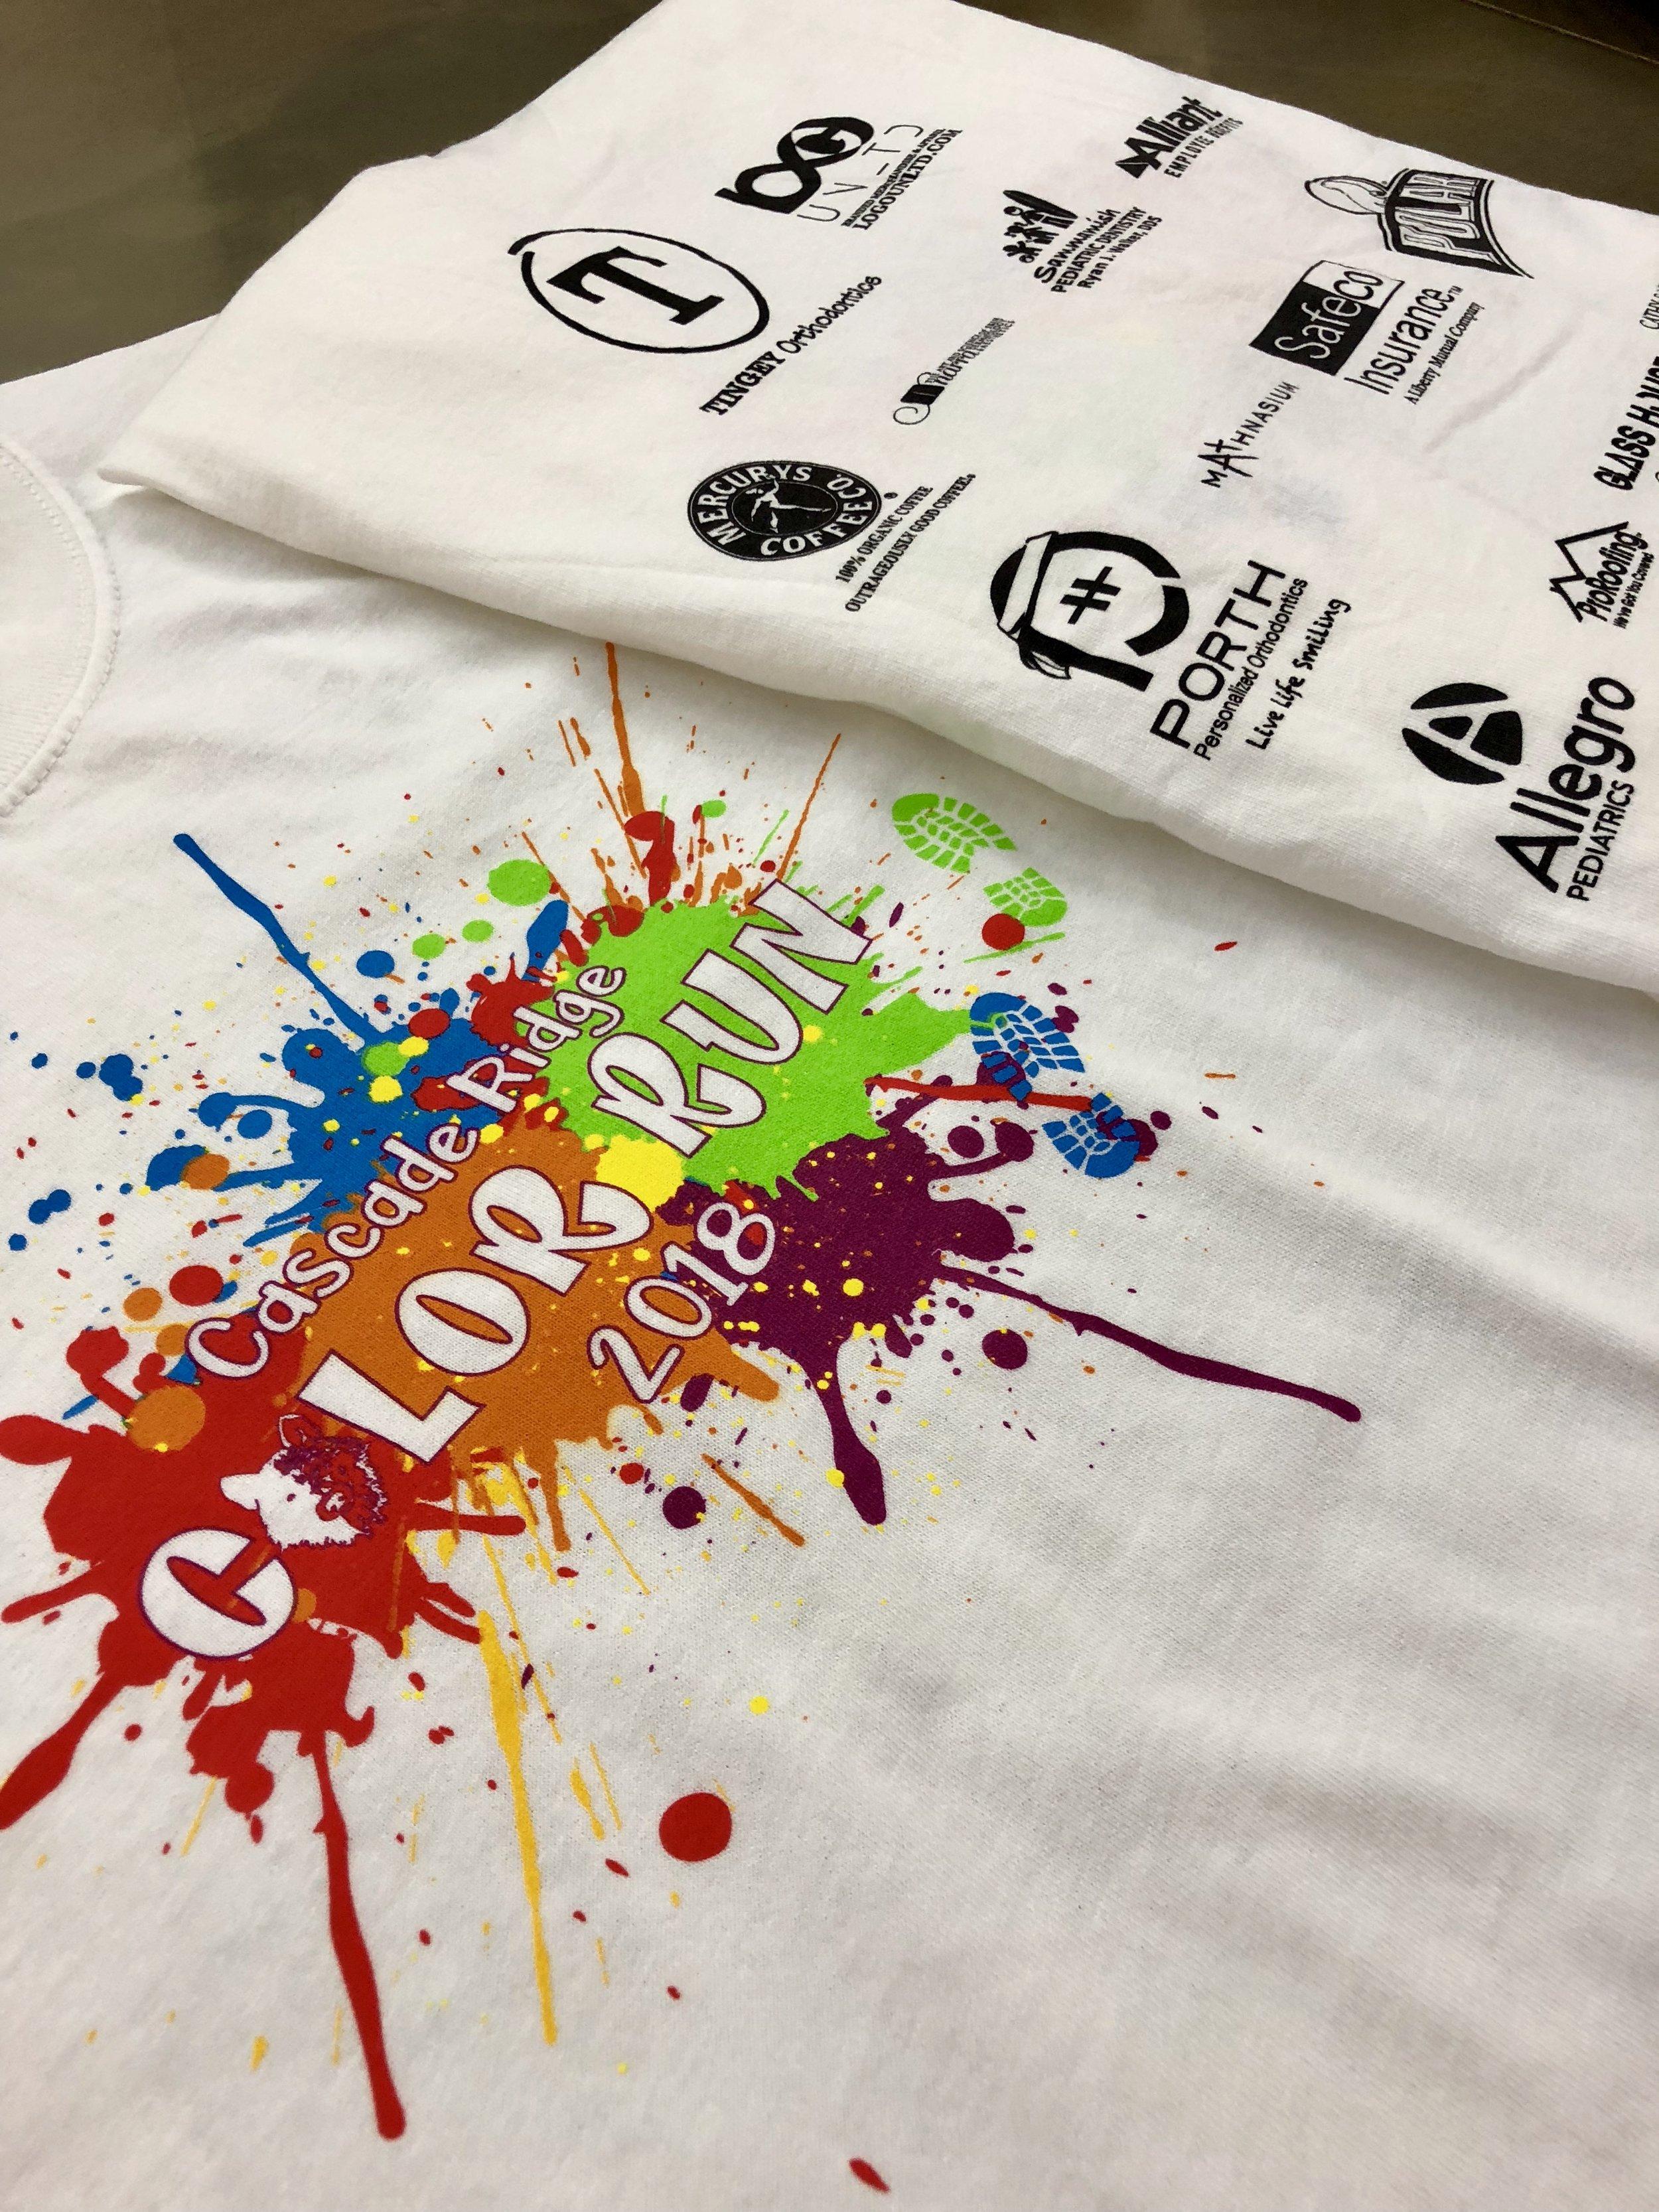 logounltd_laser_etching_embroidery_screen_printing_apparel_uniform_custom_tshirts_dye_sublimation_kirkland_bellevue_seattle_redmond_branded_merchandise_promotional_products_logo_unltd_cascade_ridge_school (2).jpg